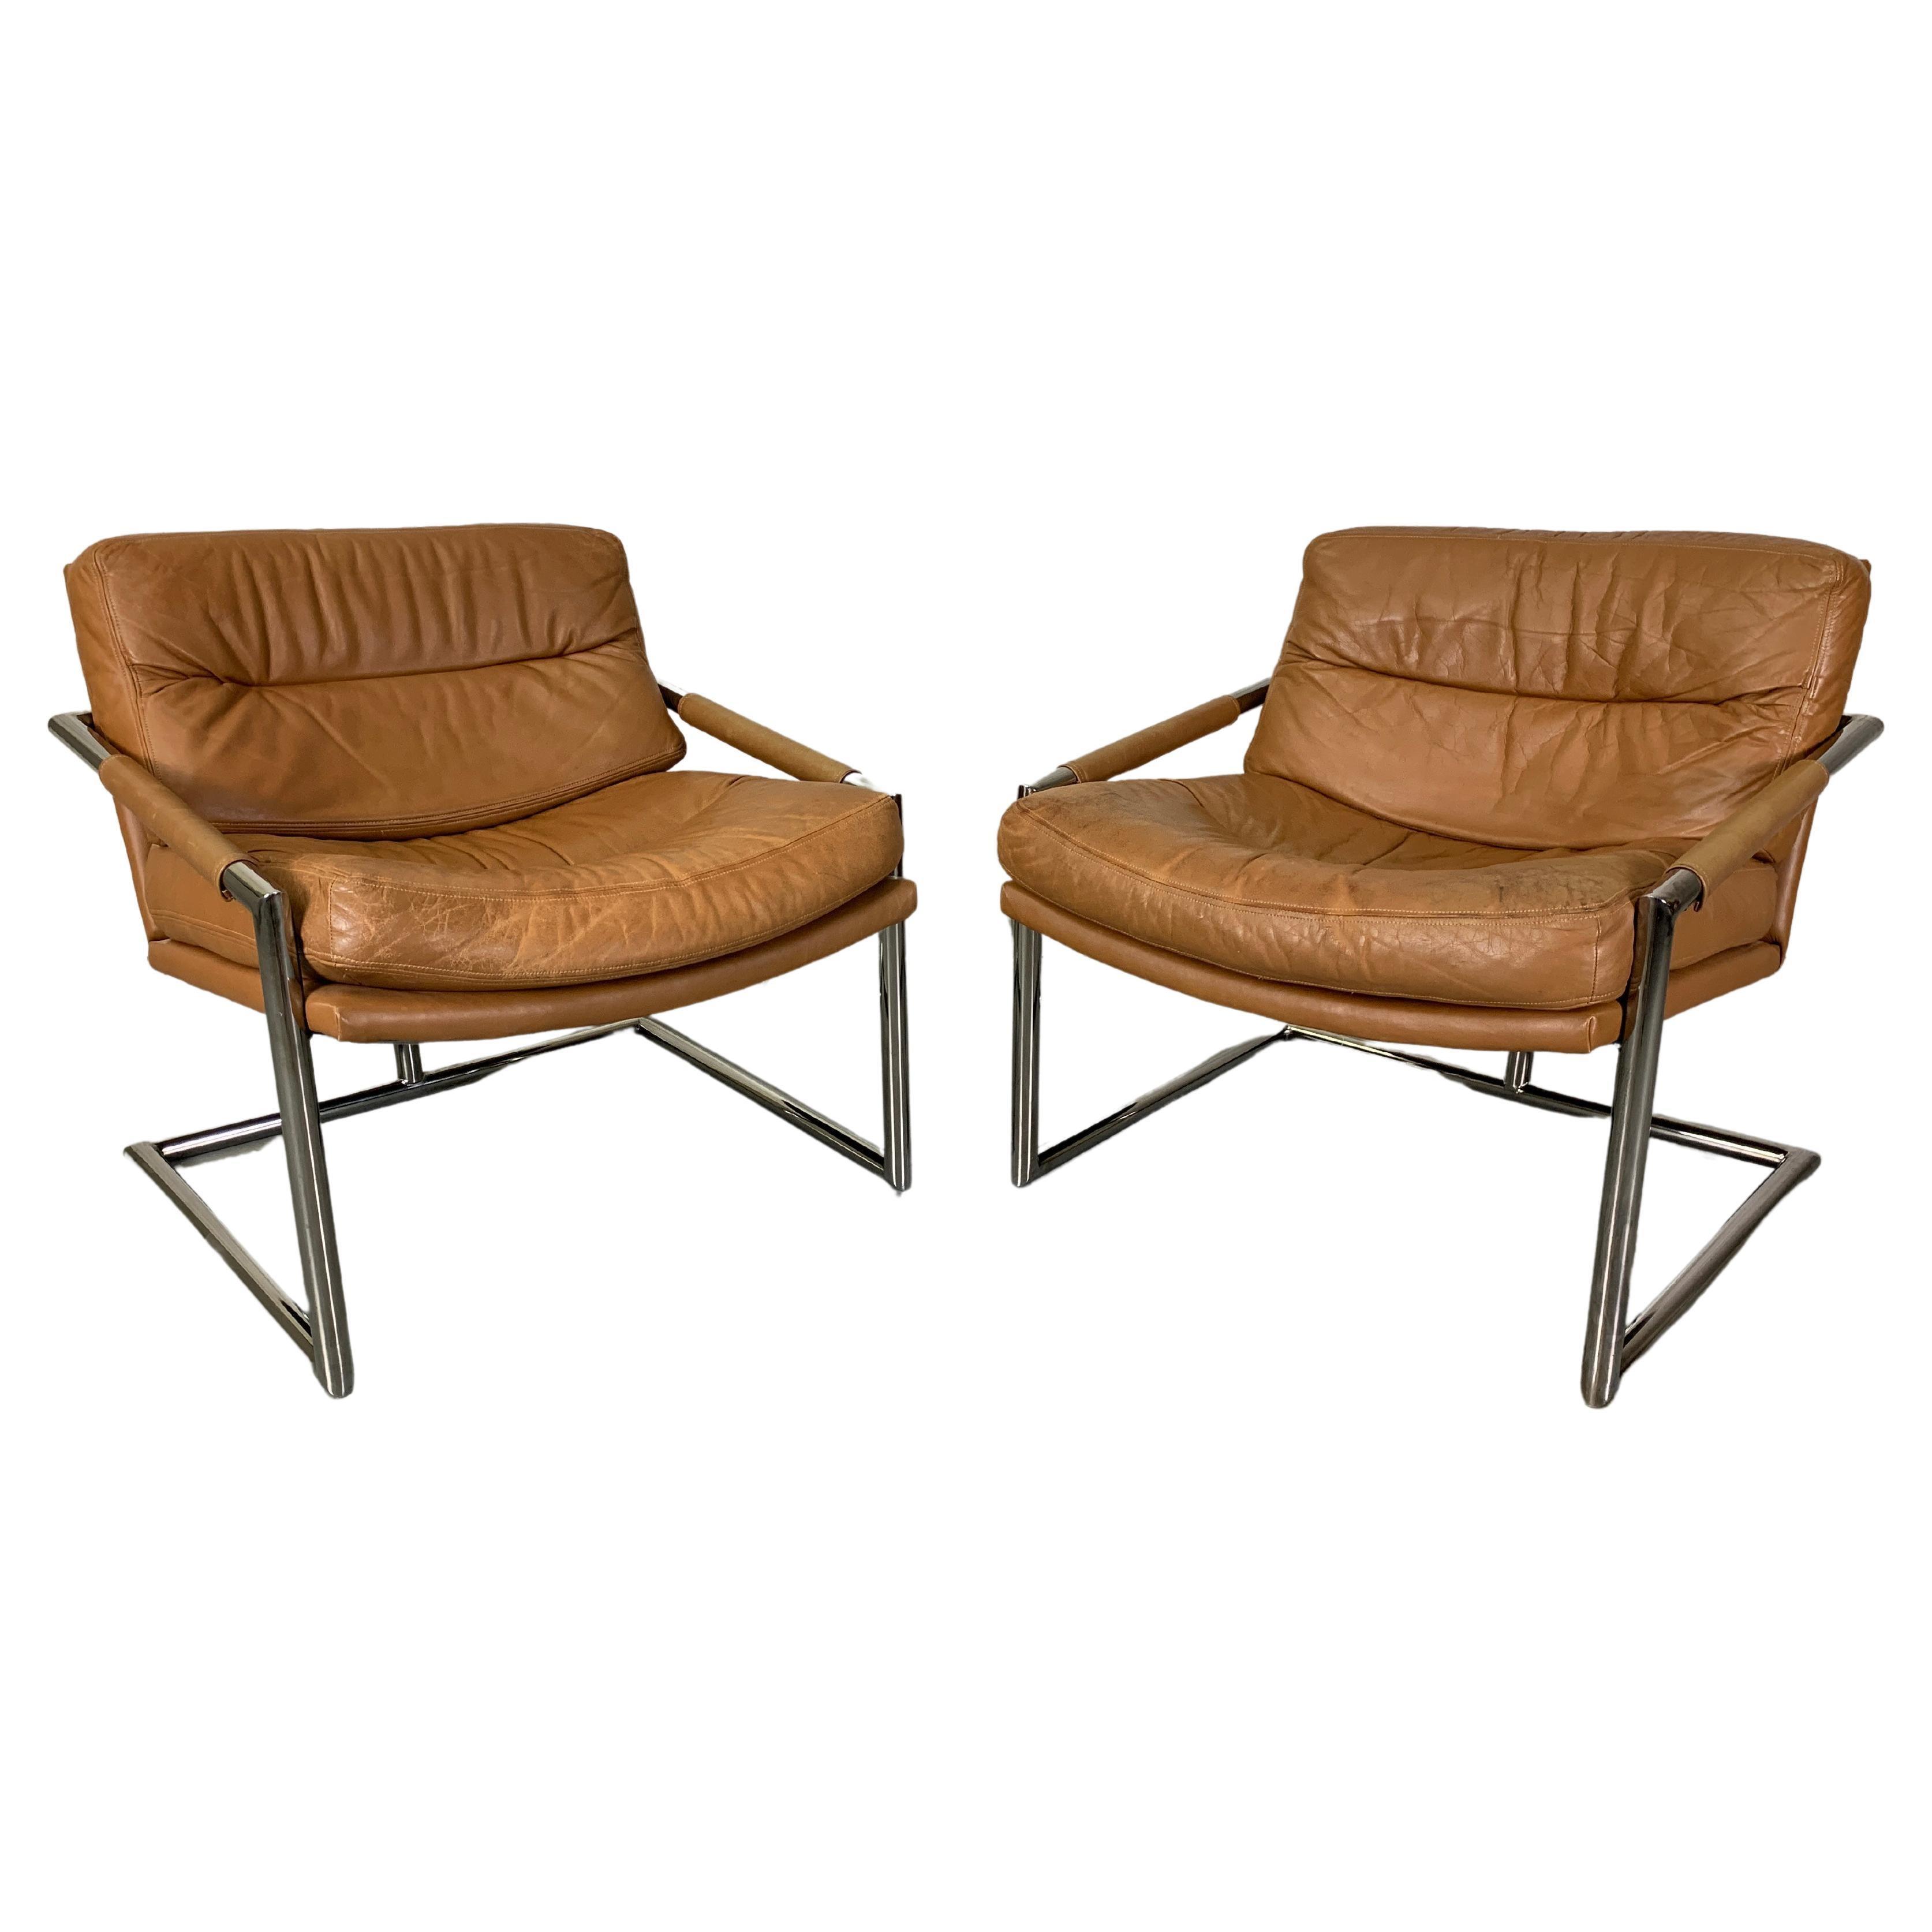 Milo Baughman Style Chrome & Leather Lounge Chairs